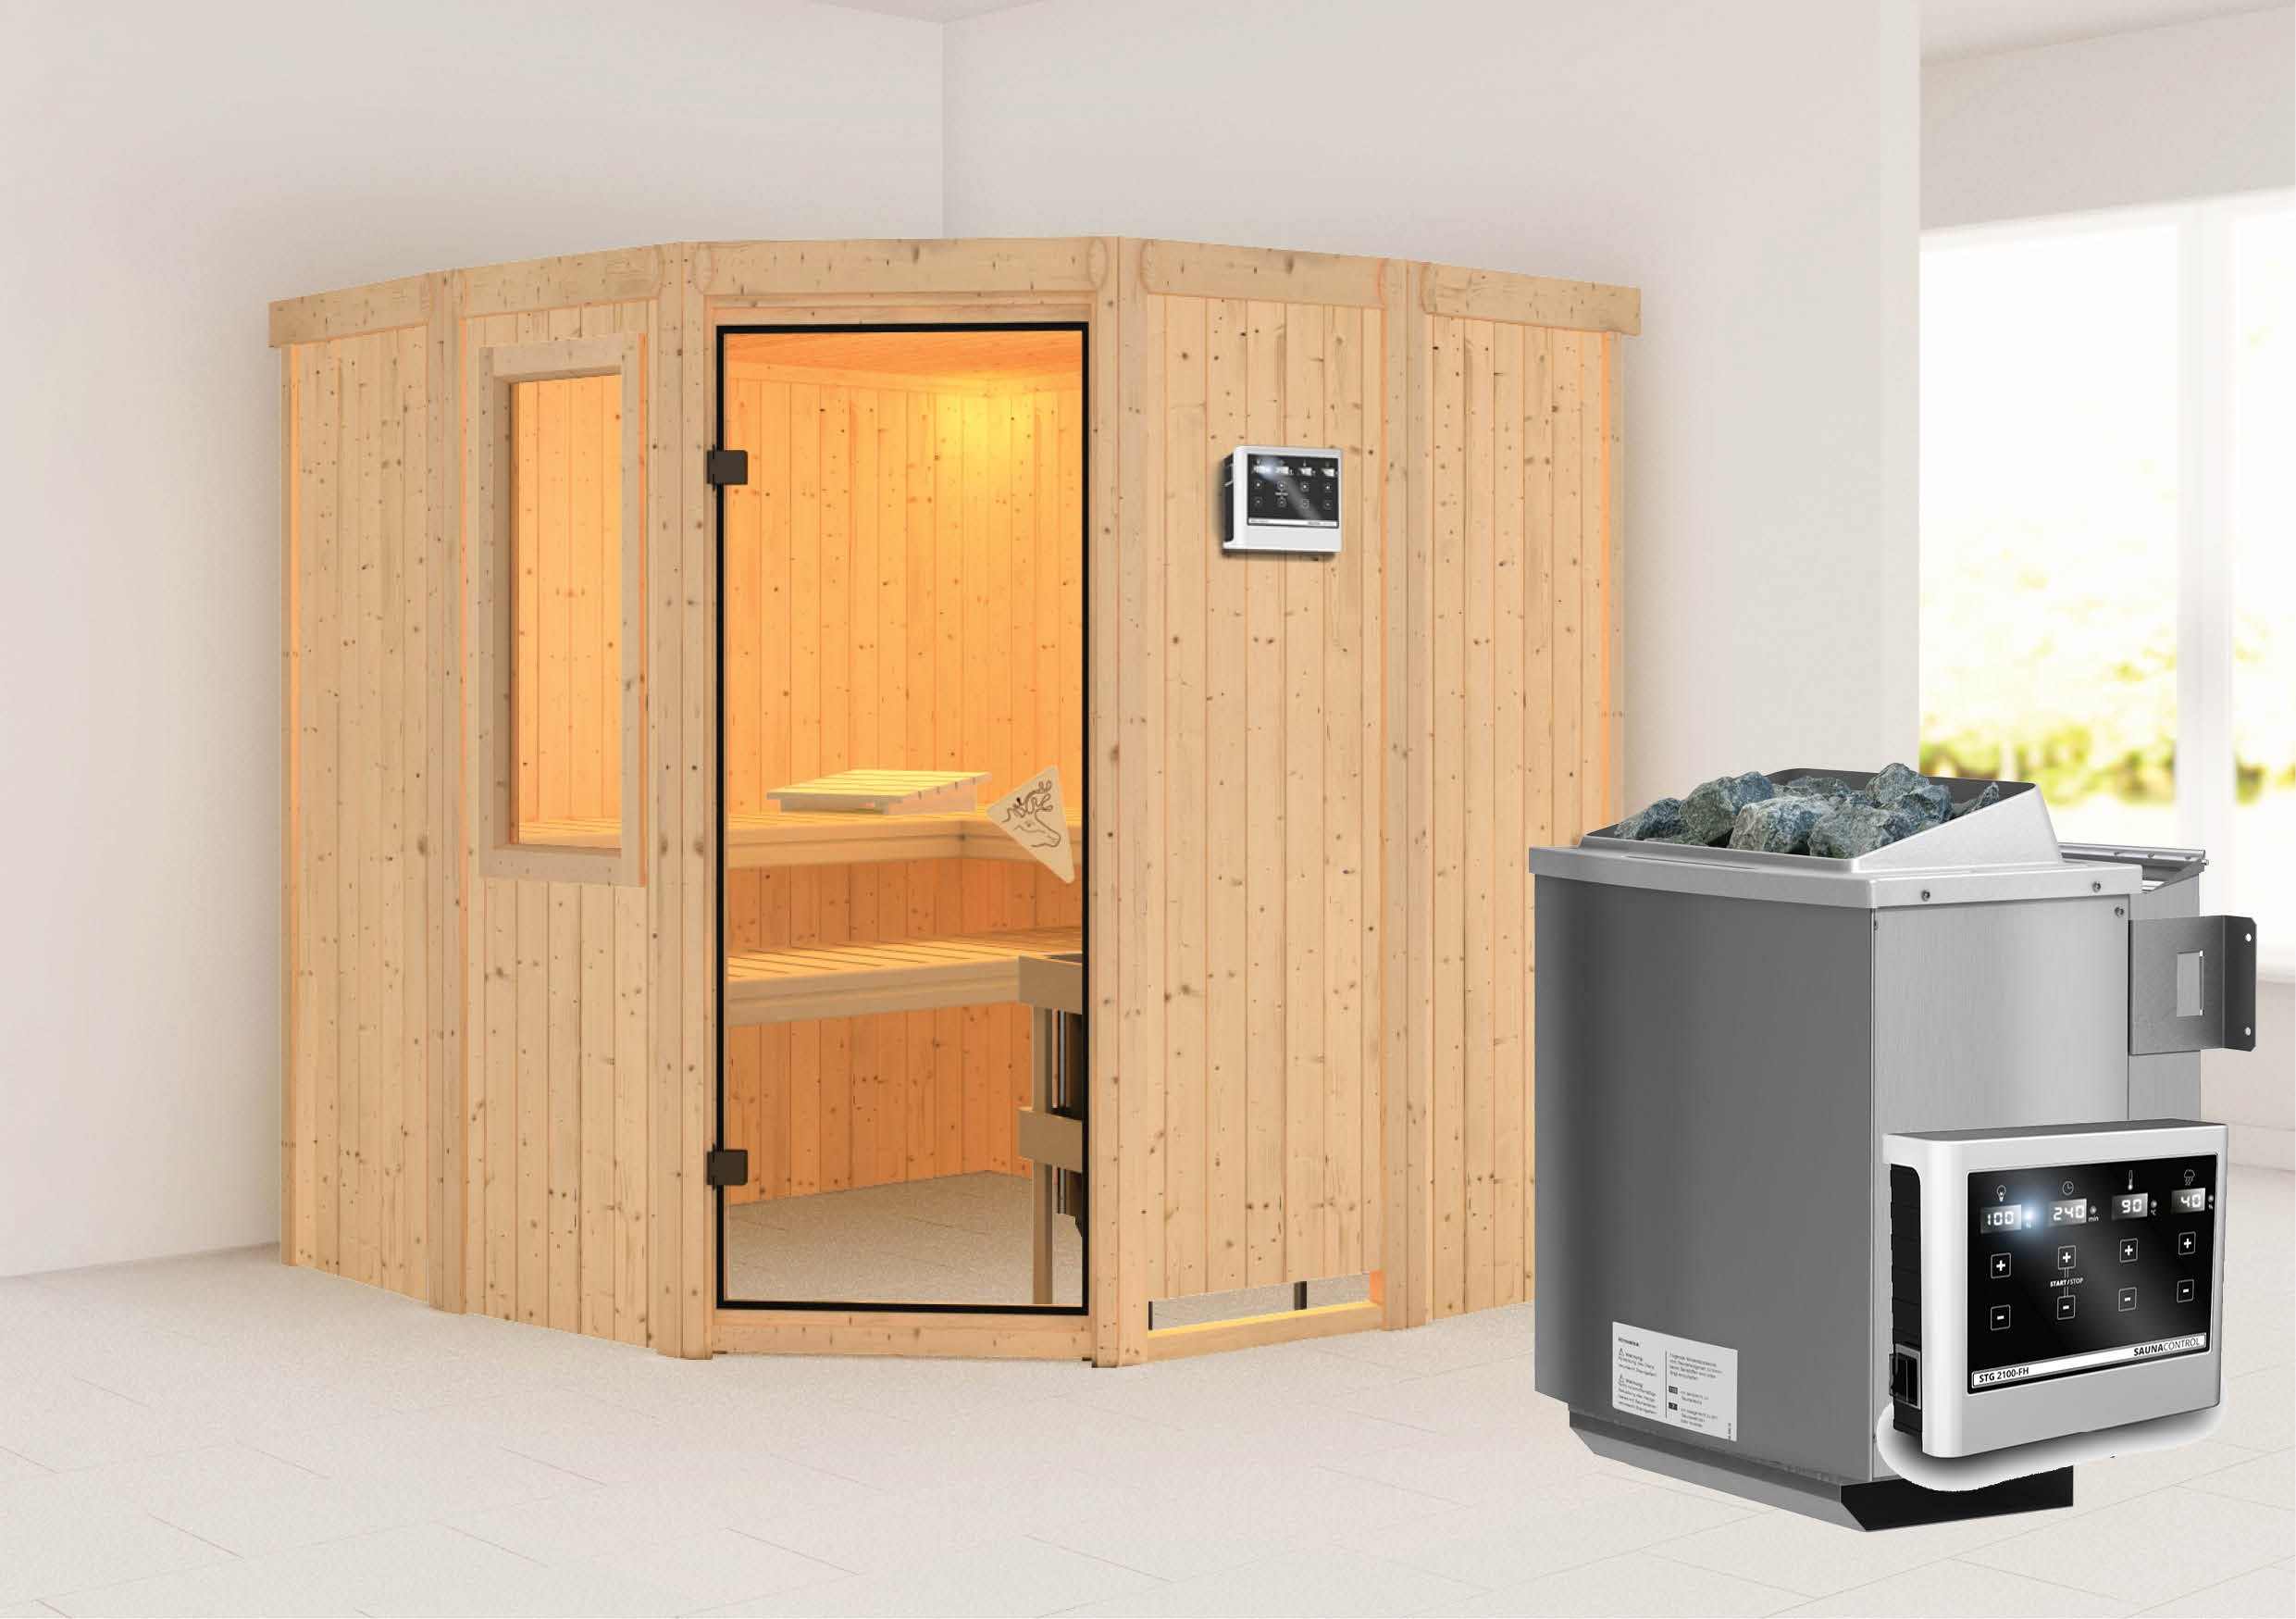 Karibu Sauna Simara 1 68mm Fenster + Bio Ofen 9kW extern classic Tür Bild 1